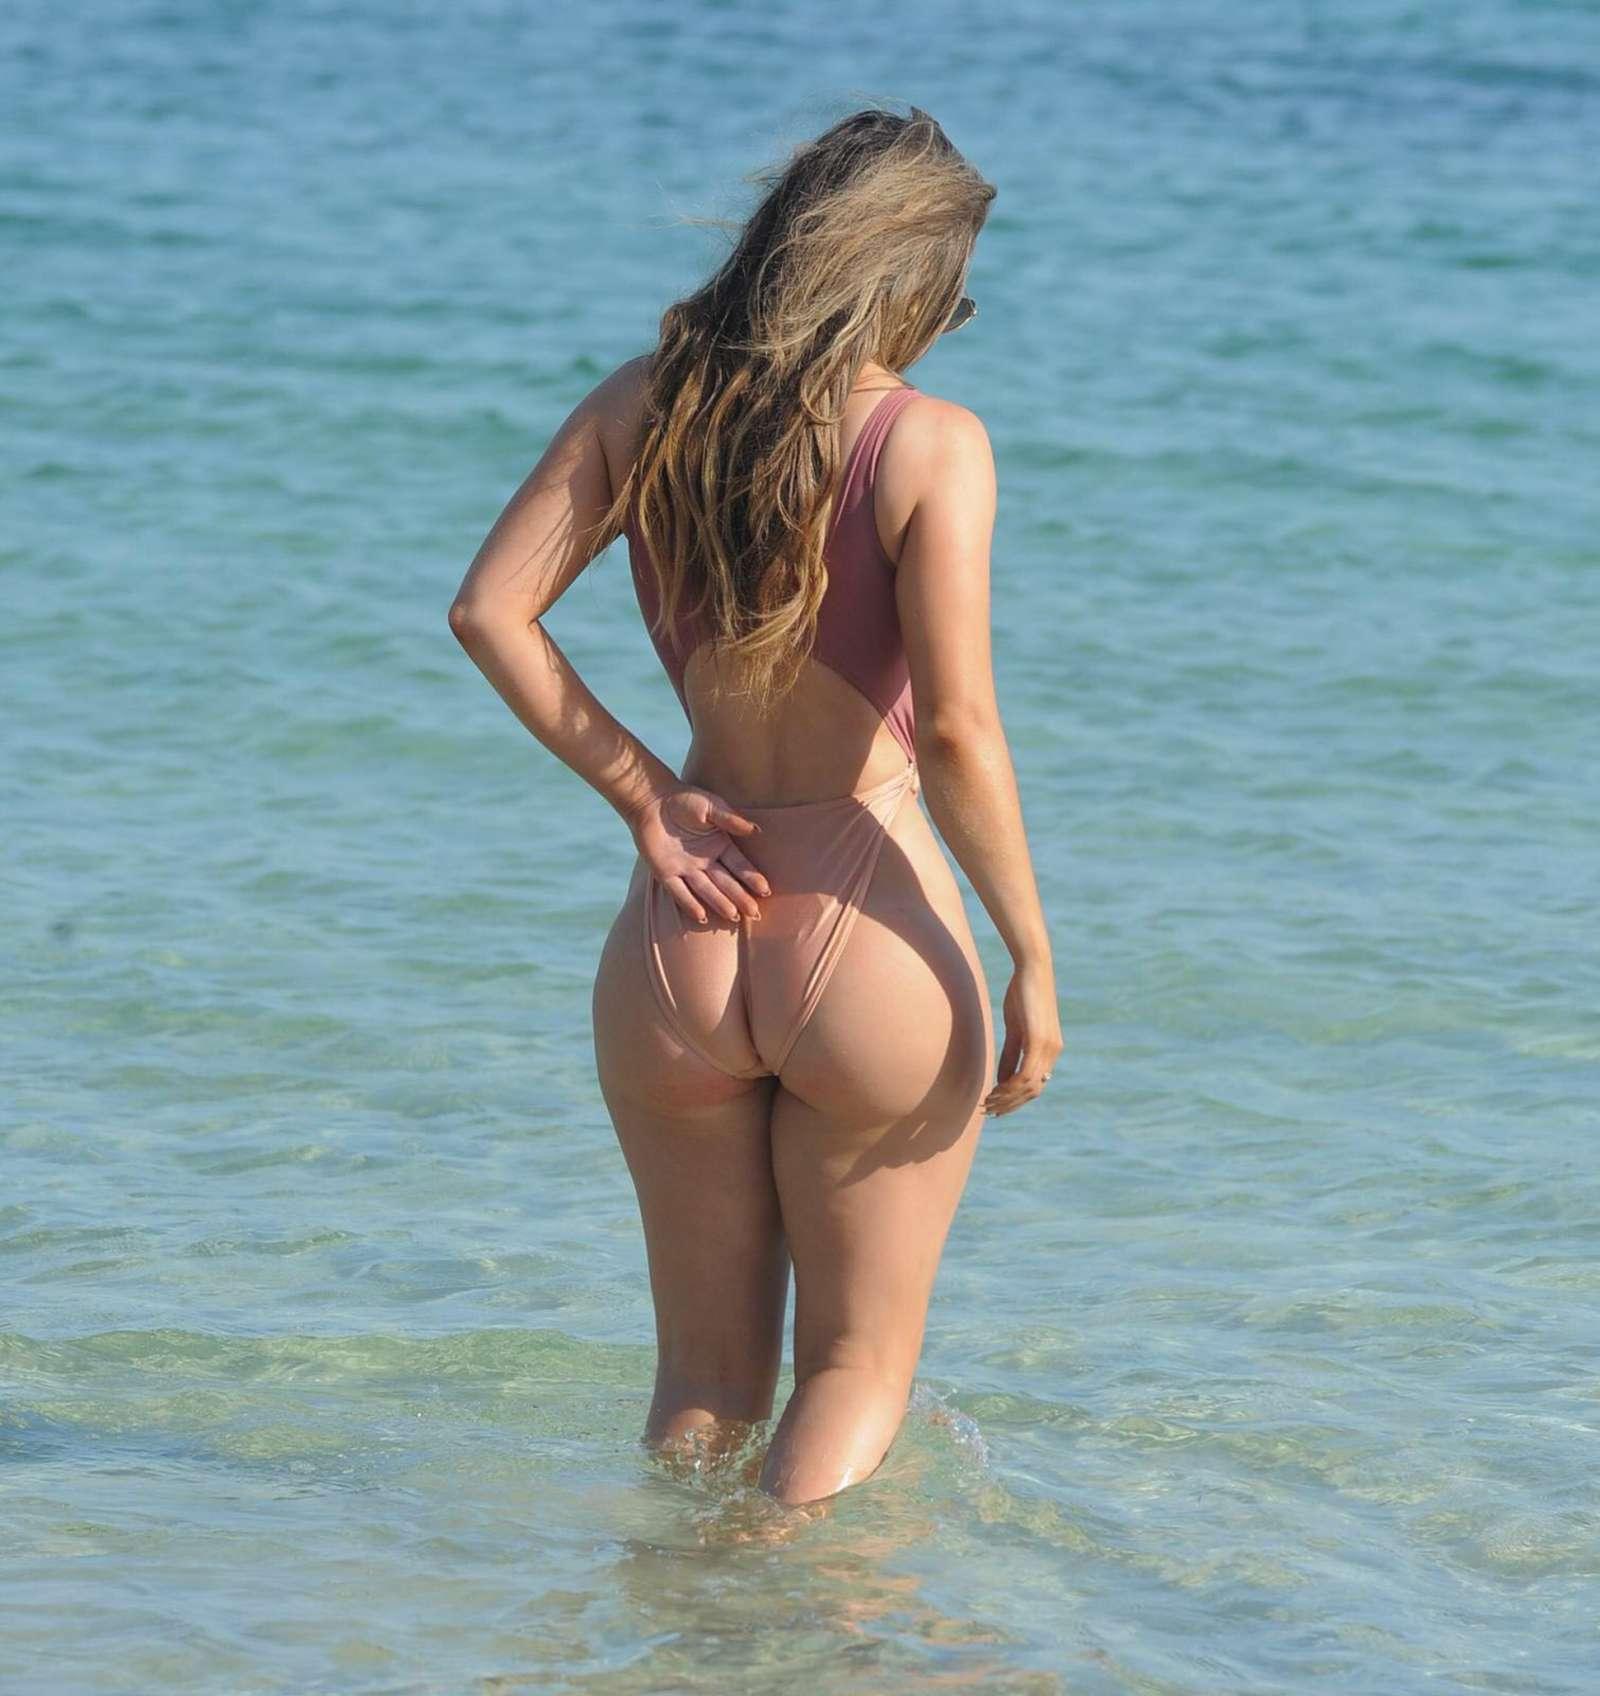 Leaked Bikini Abigail Clarke naked photo 2017